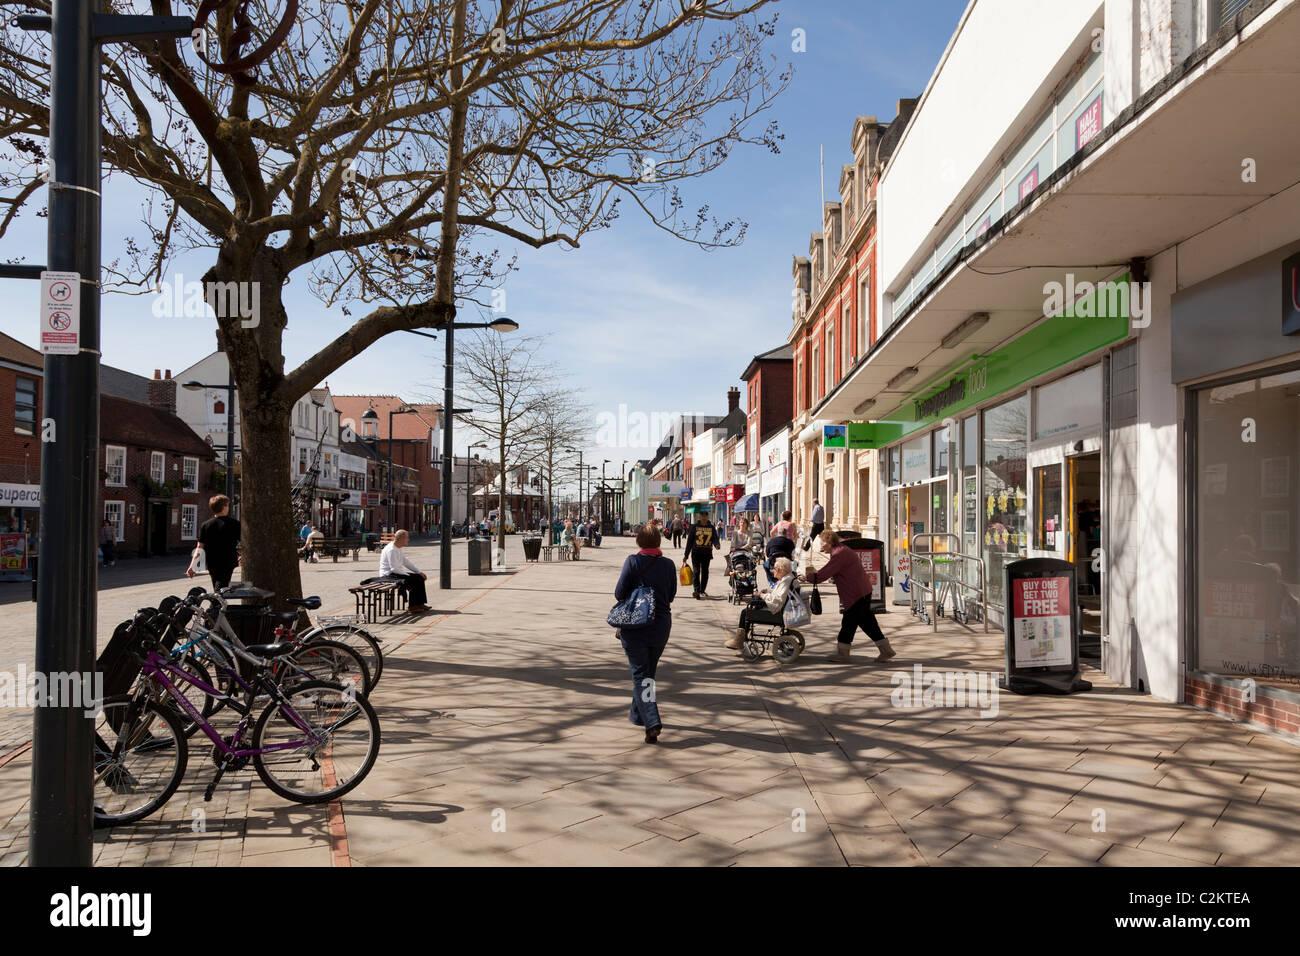 Fareham high street pedestrianised road - Stock Image